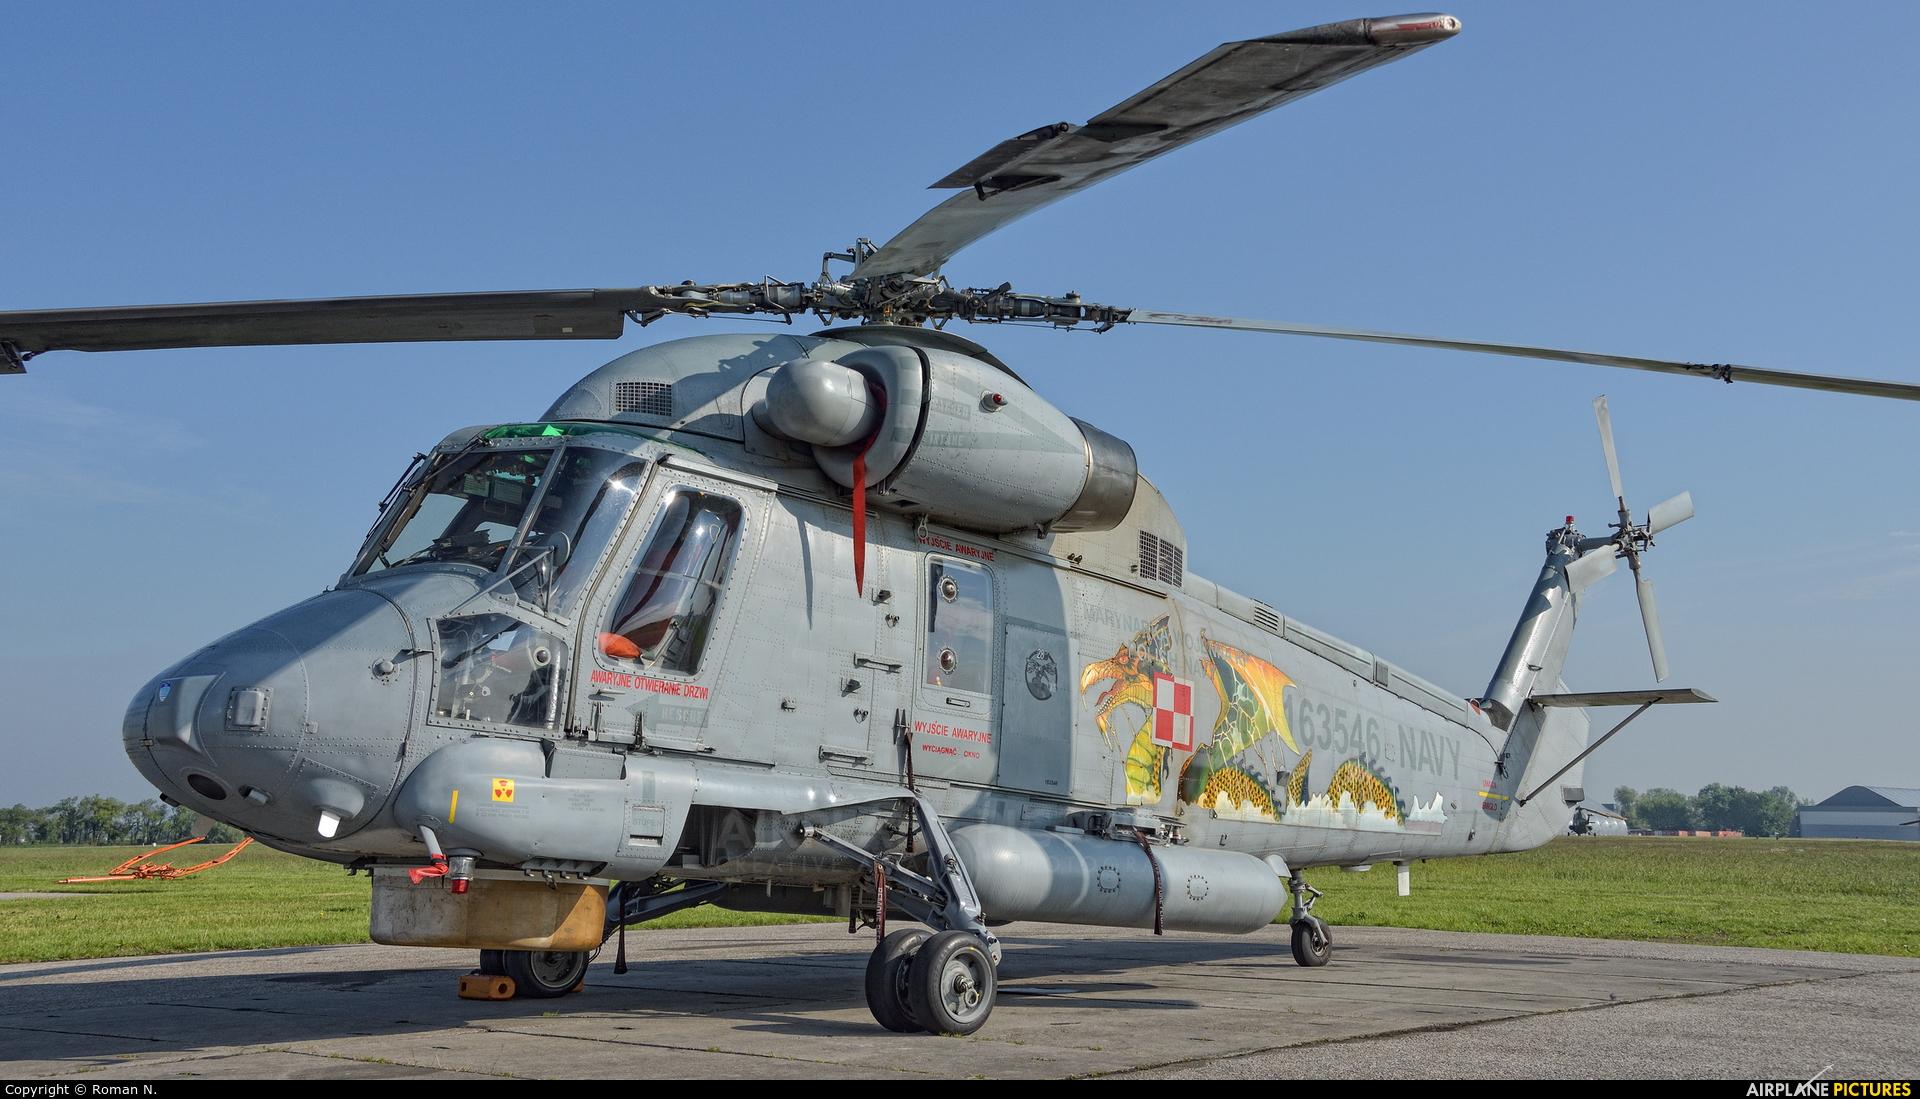 Poland - Navy 163546 aircraft at Inowrocław - Latkowo